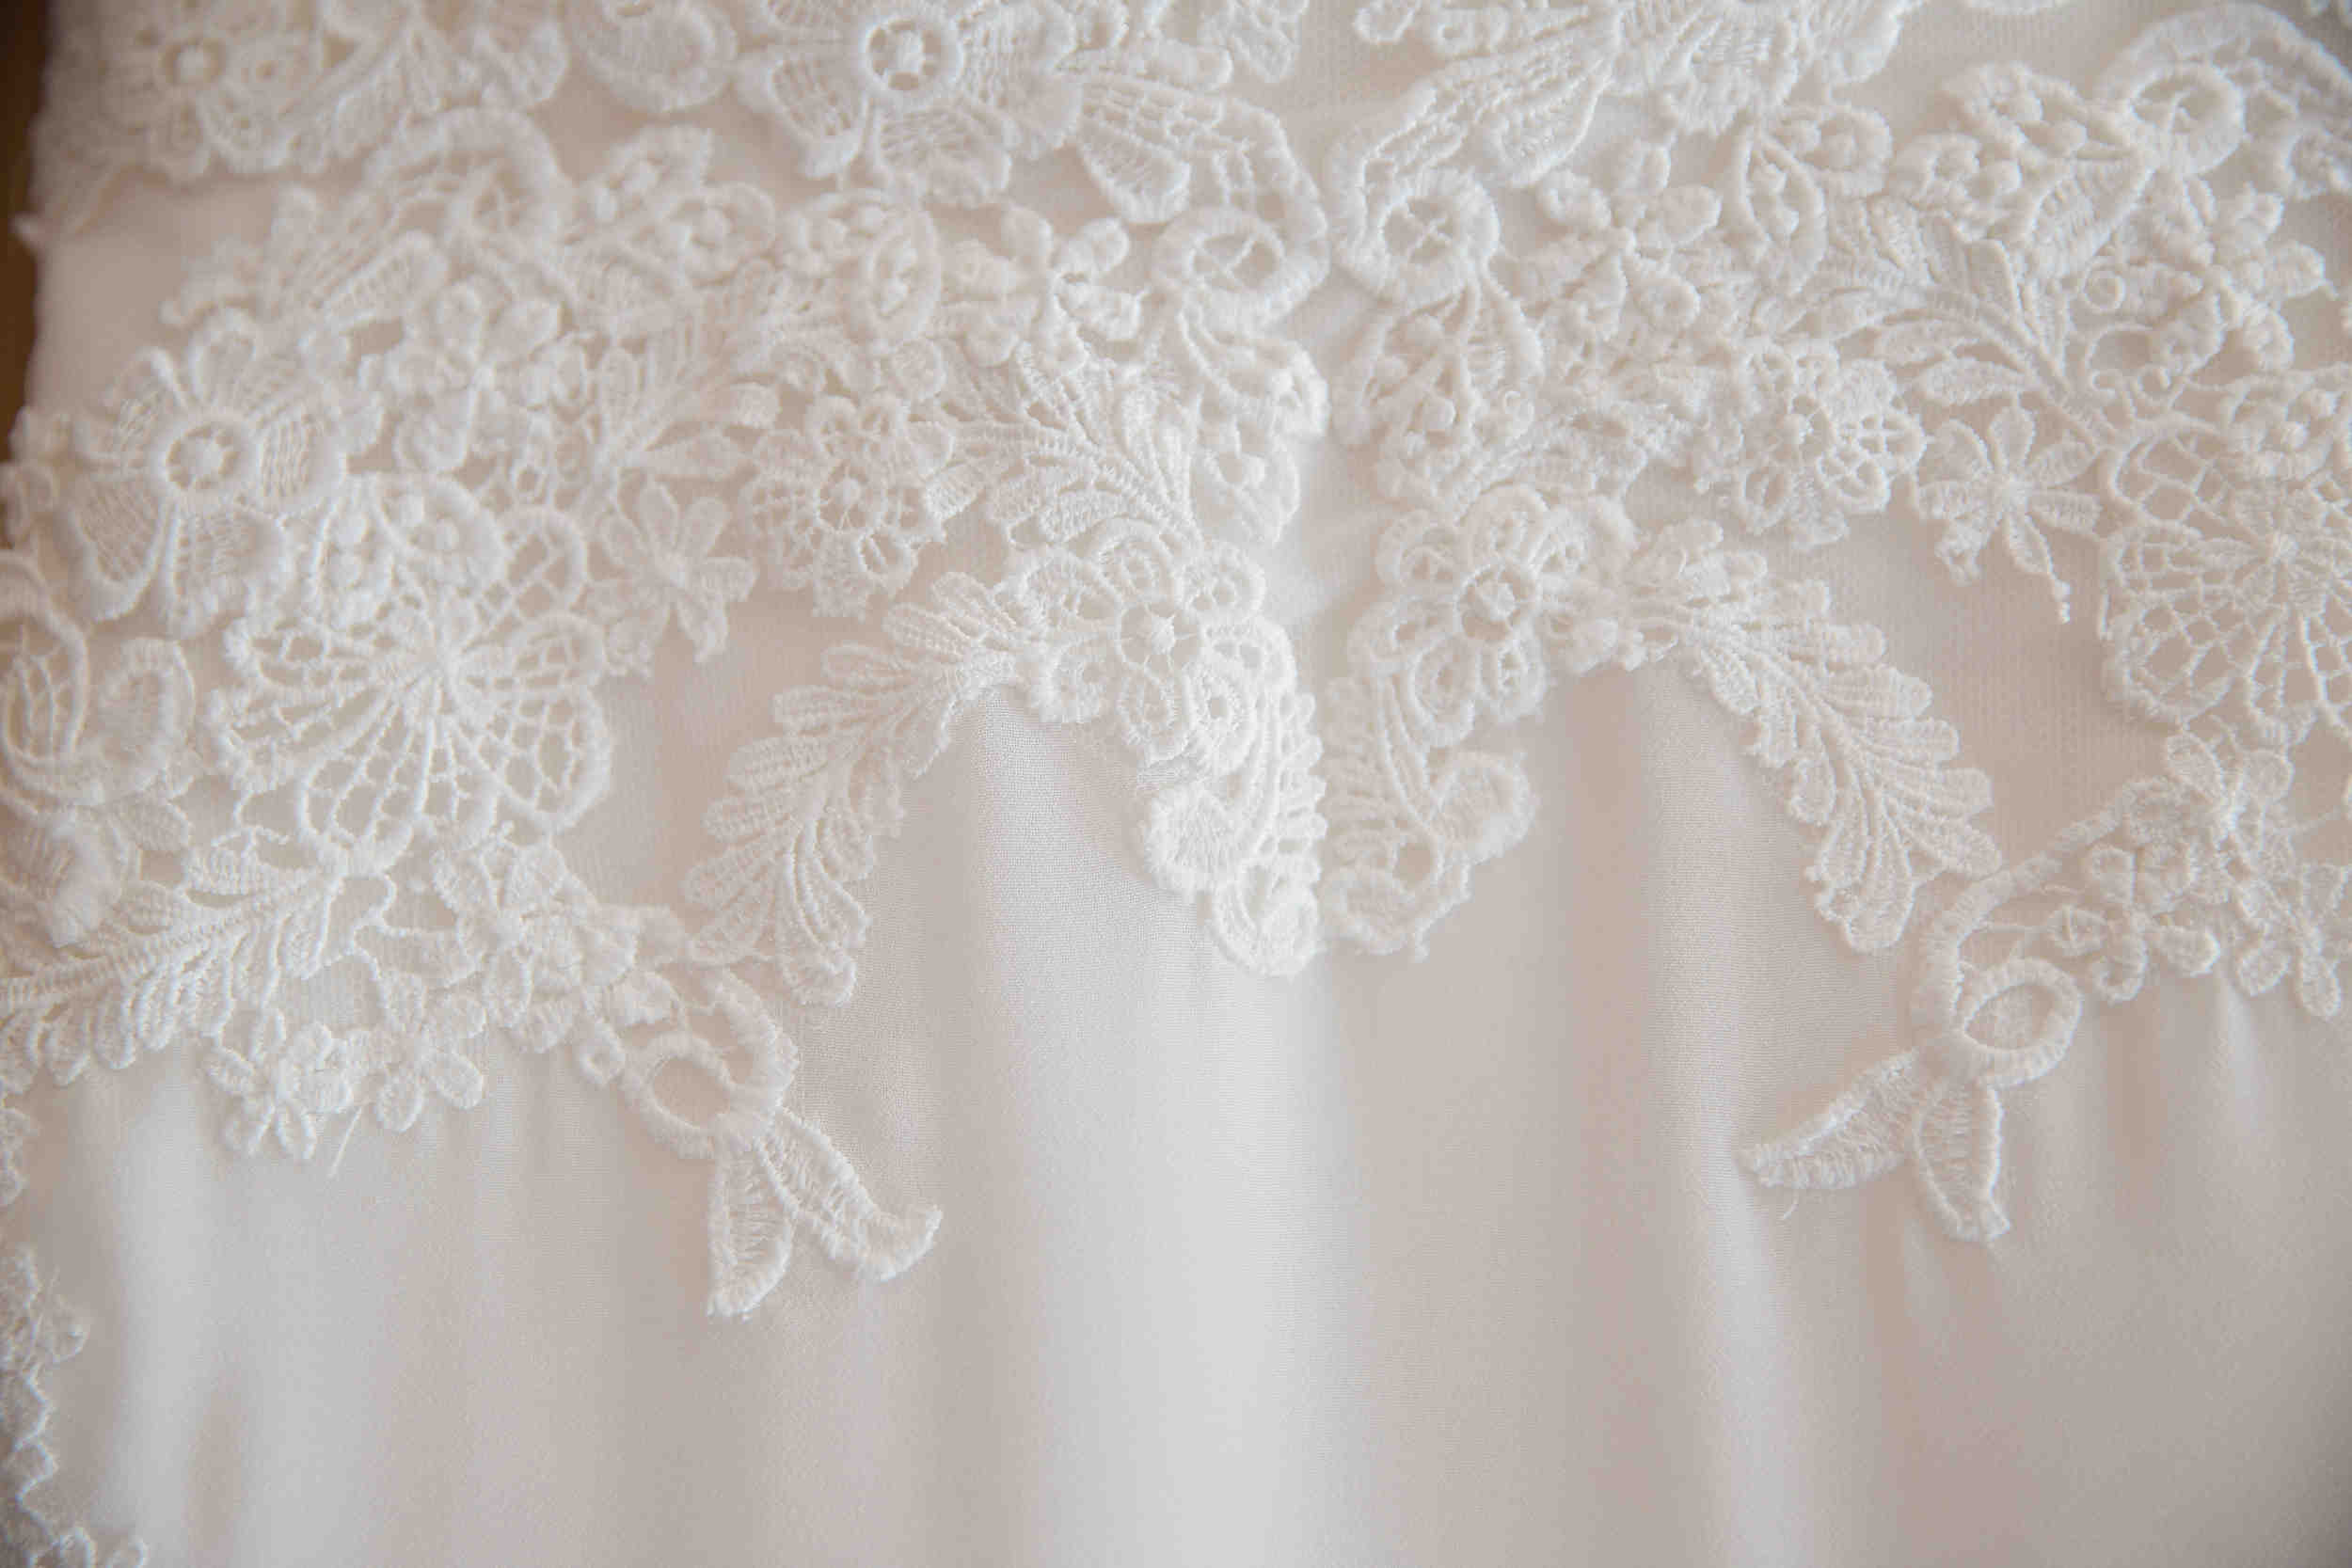 Modern_Stylish_Wedding_at_Swallows_Nest_Barn1132